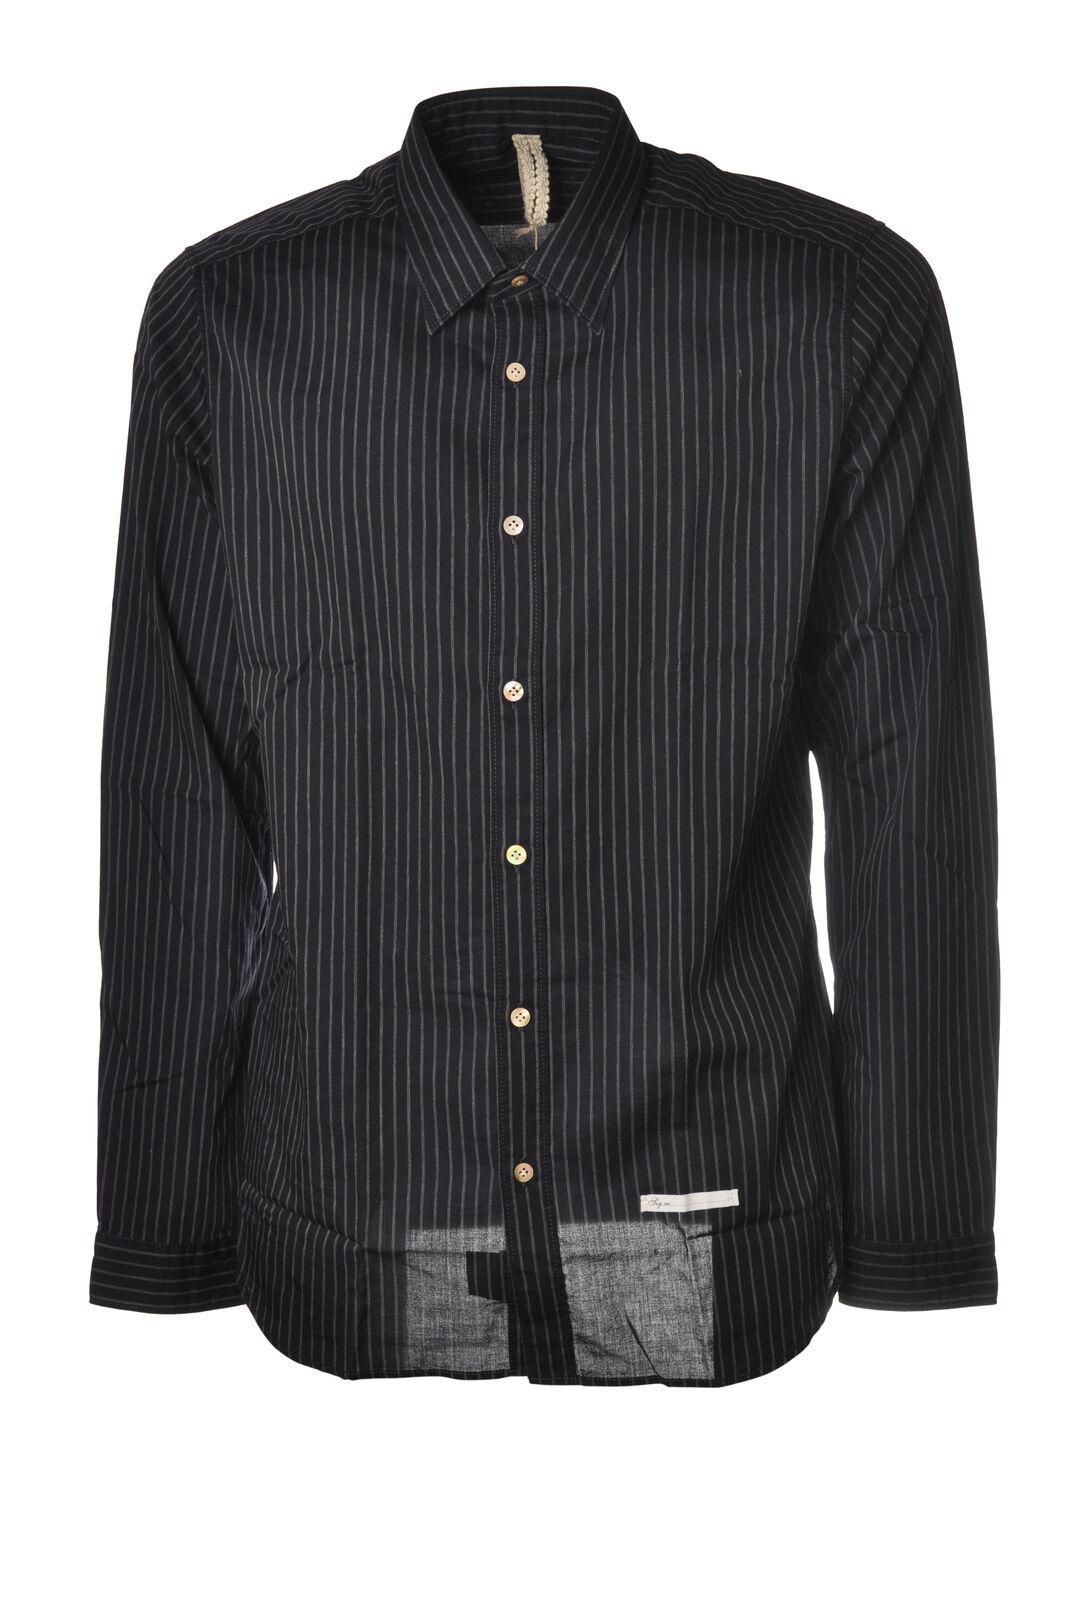 Dnl - Shirts-Shirt - Man - bluee - 5632325N184140